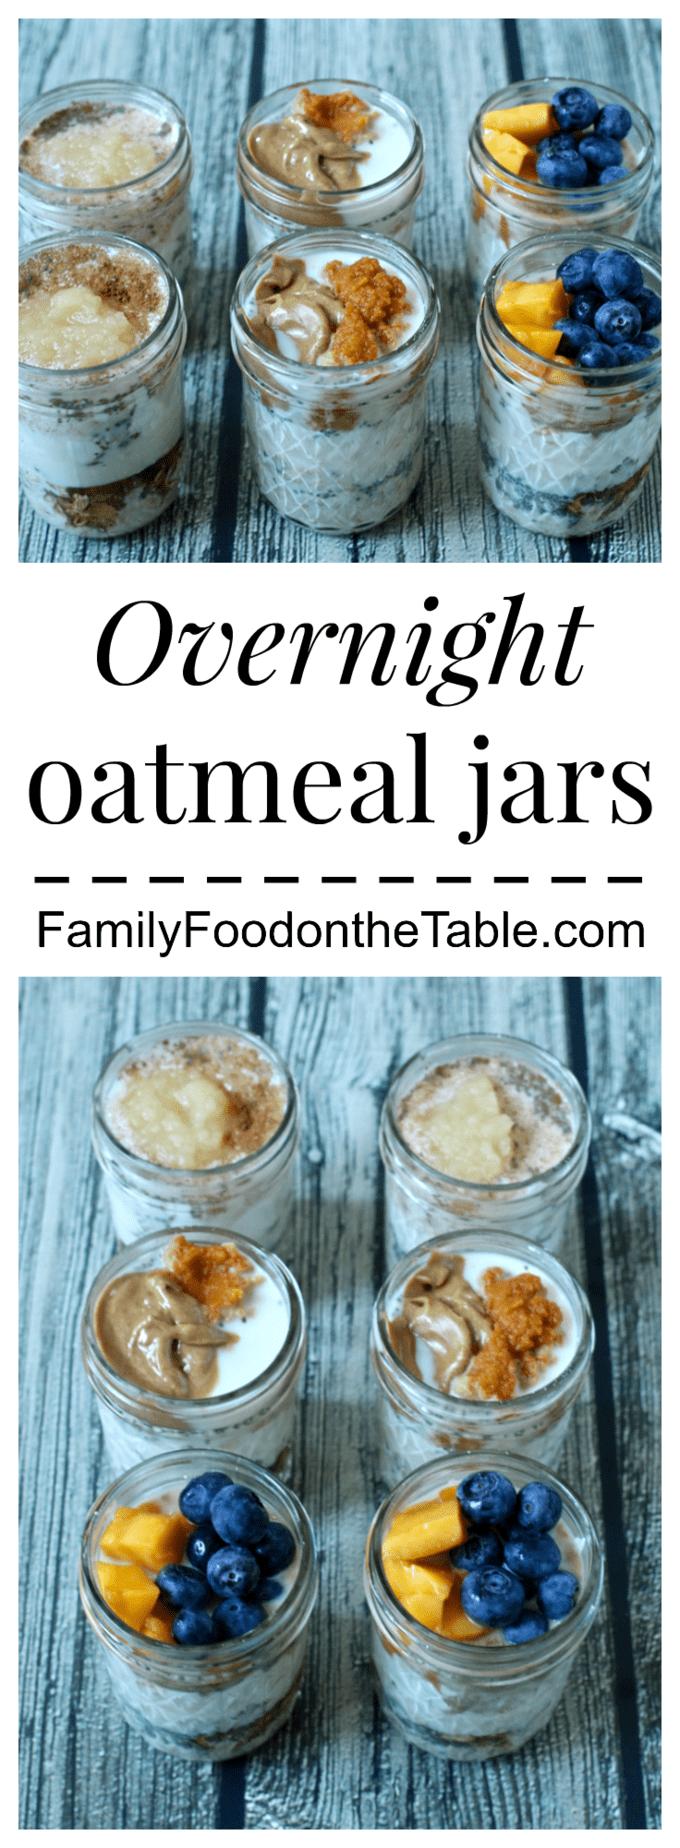 Quaker Oats Recipes Muffins Overnight oatme...